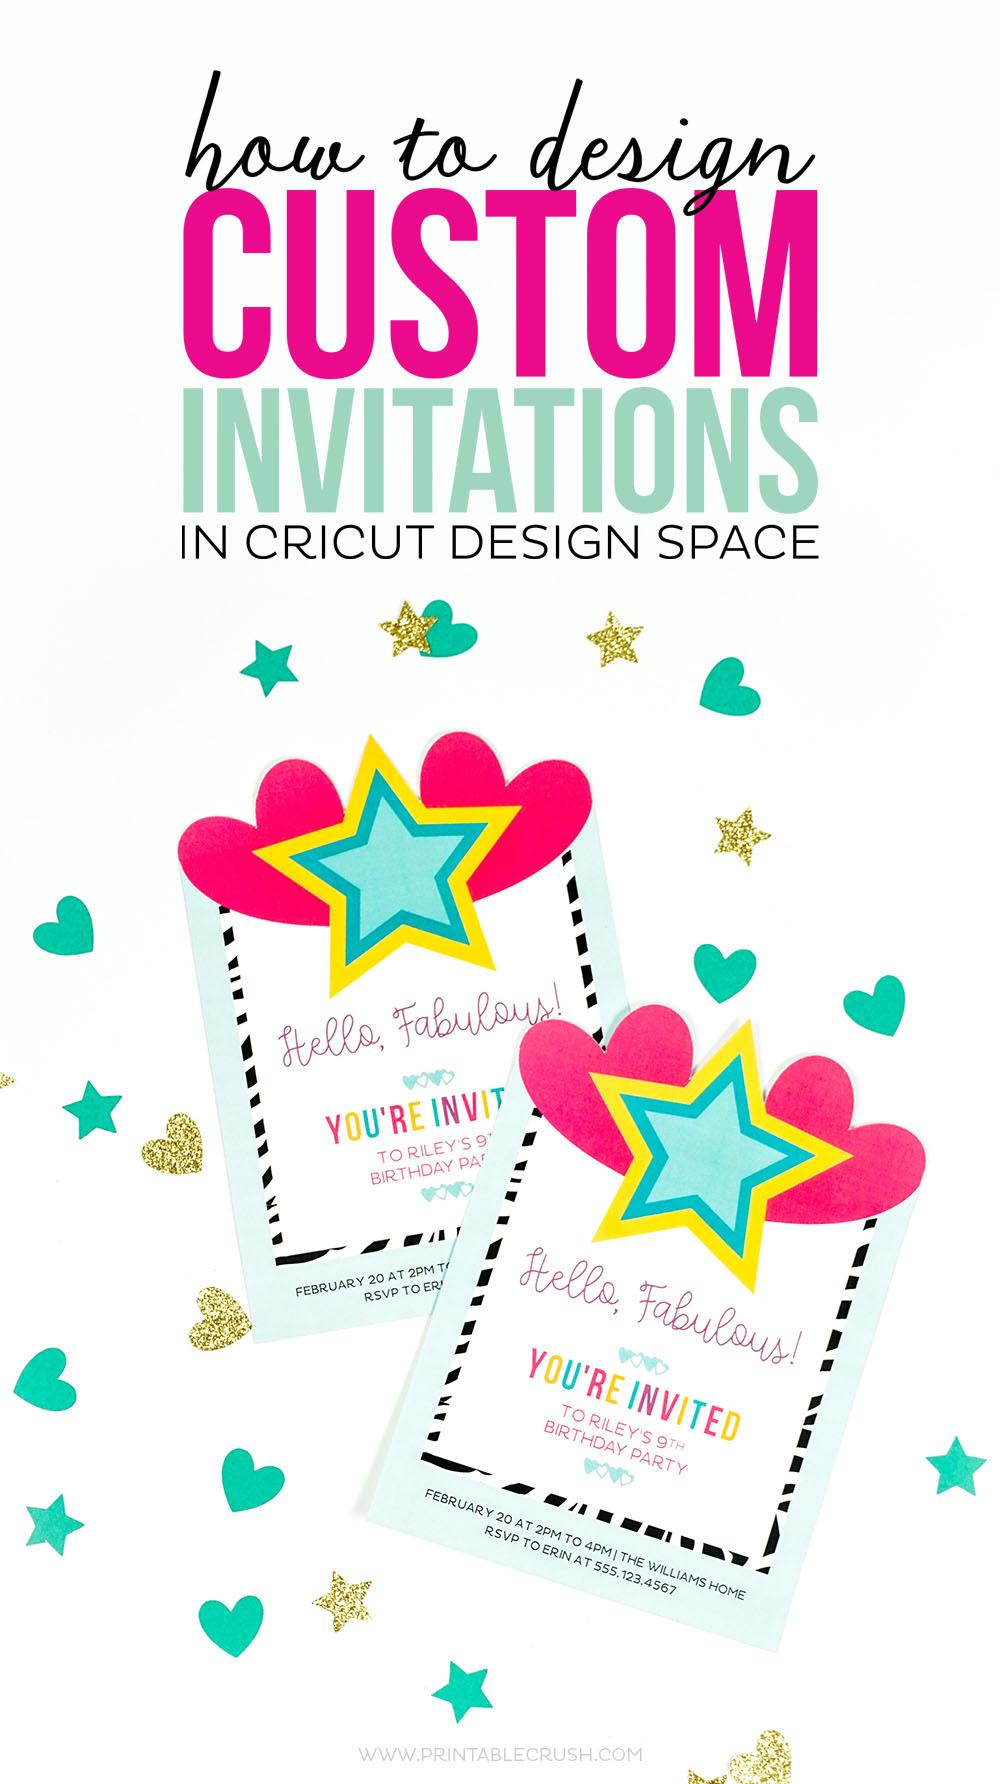 Invitation Design - Design Beautiful Custom Invitations